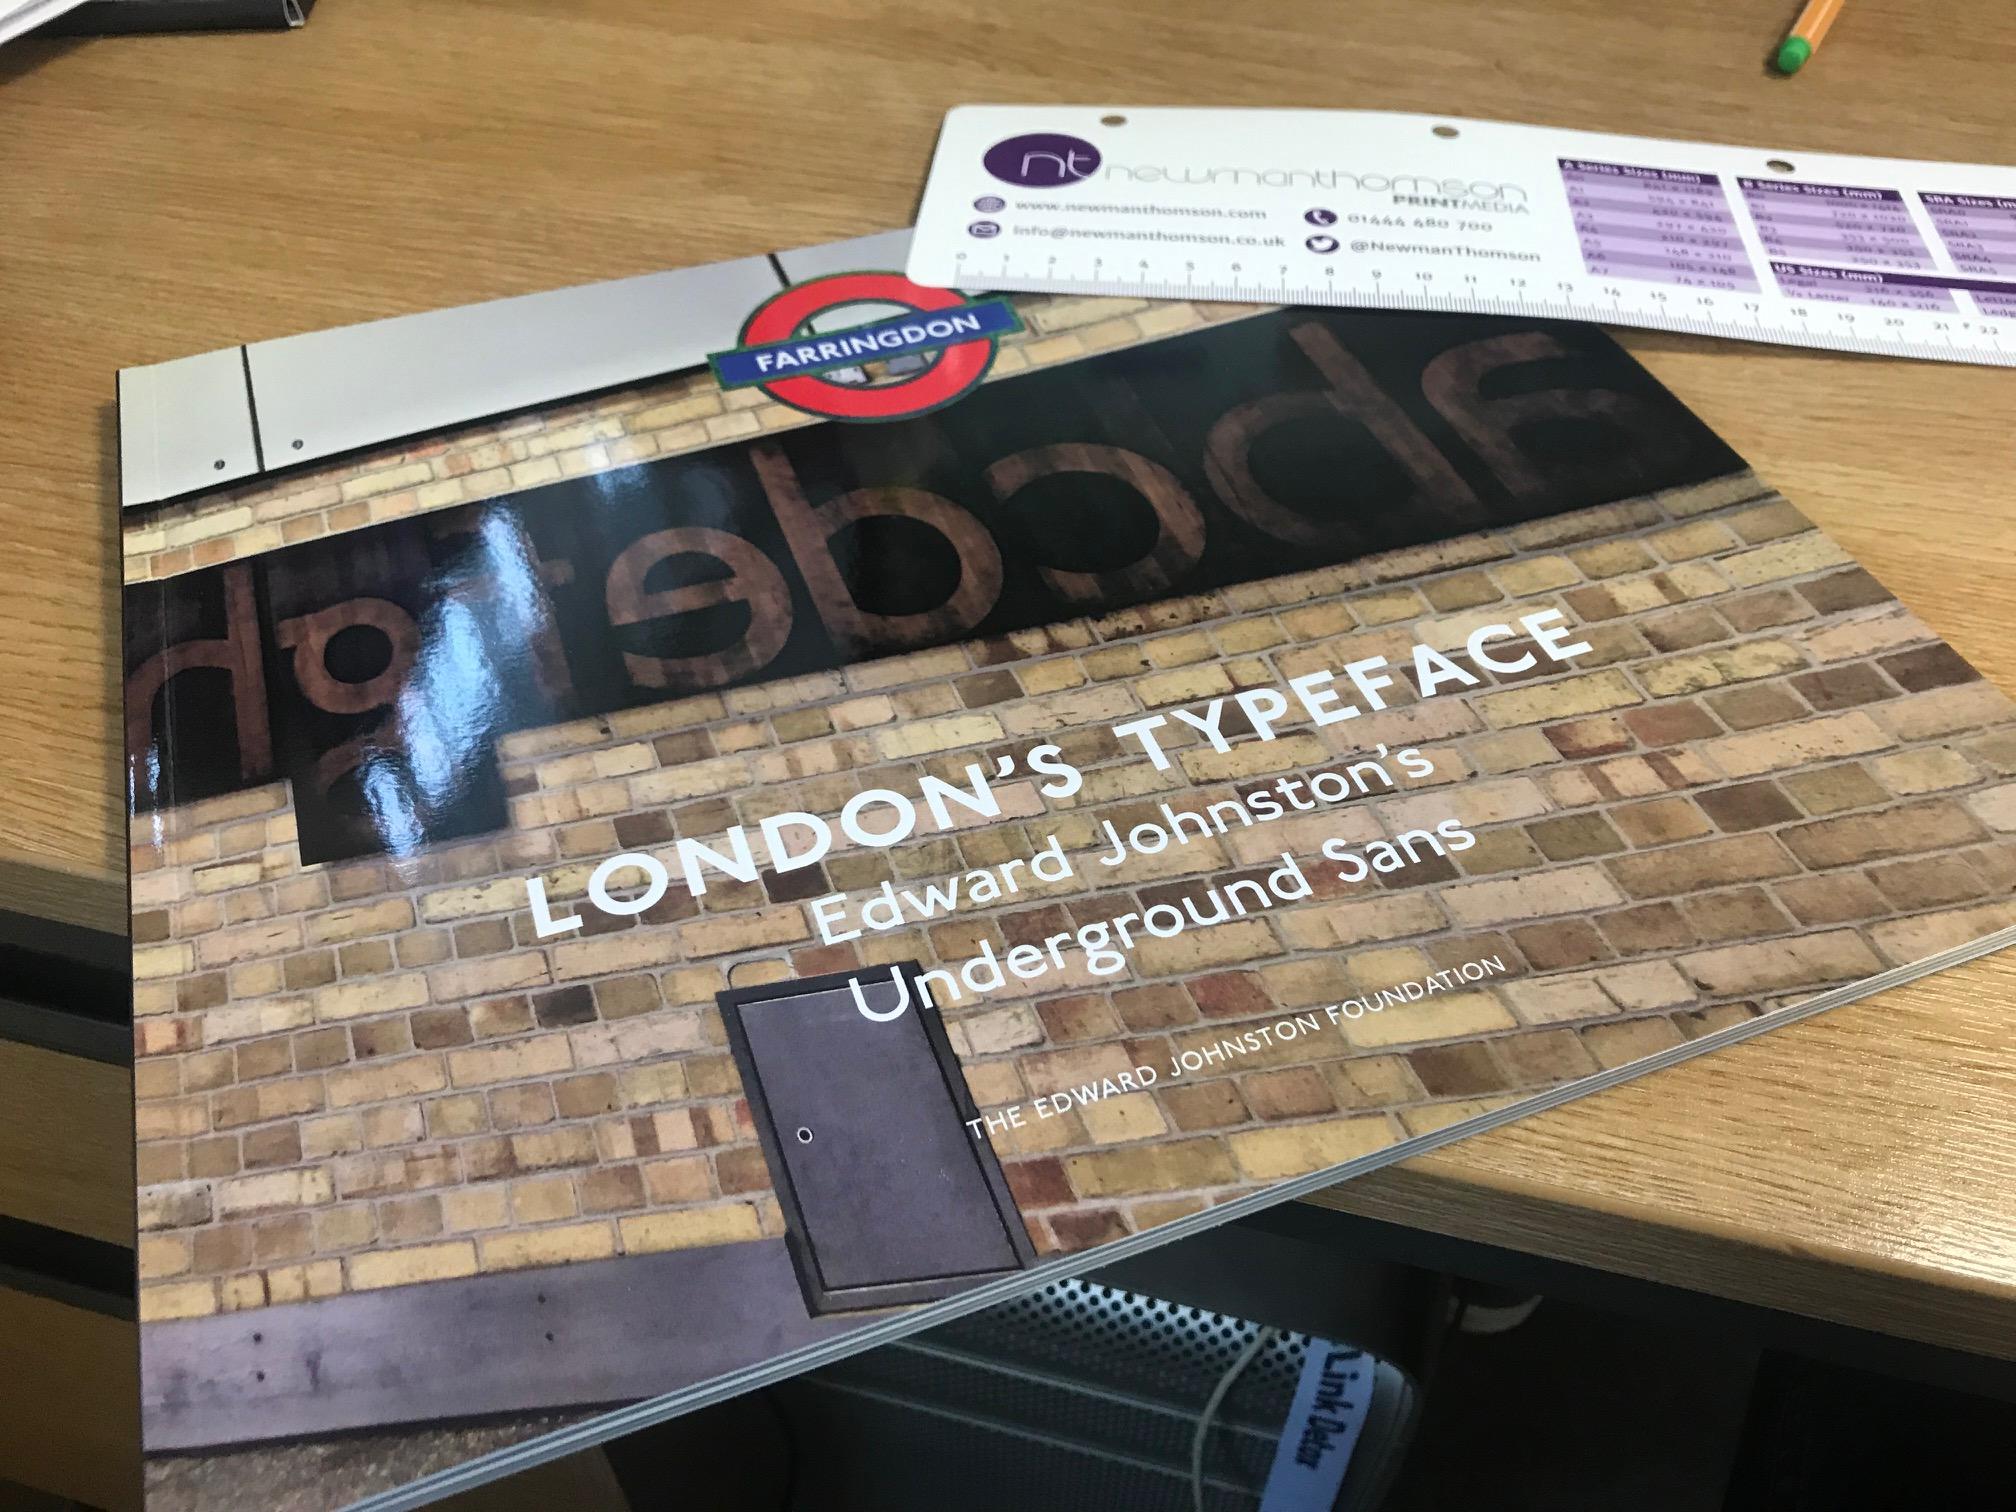 London's Typeface Book